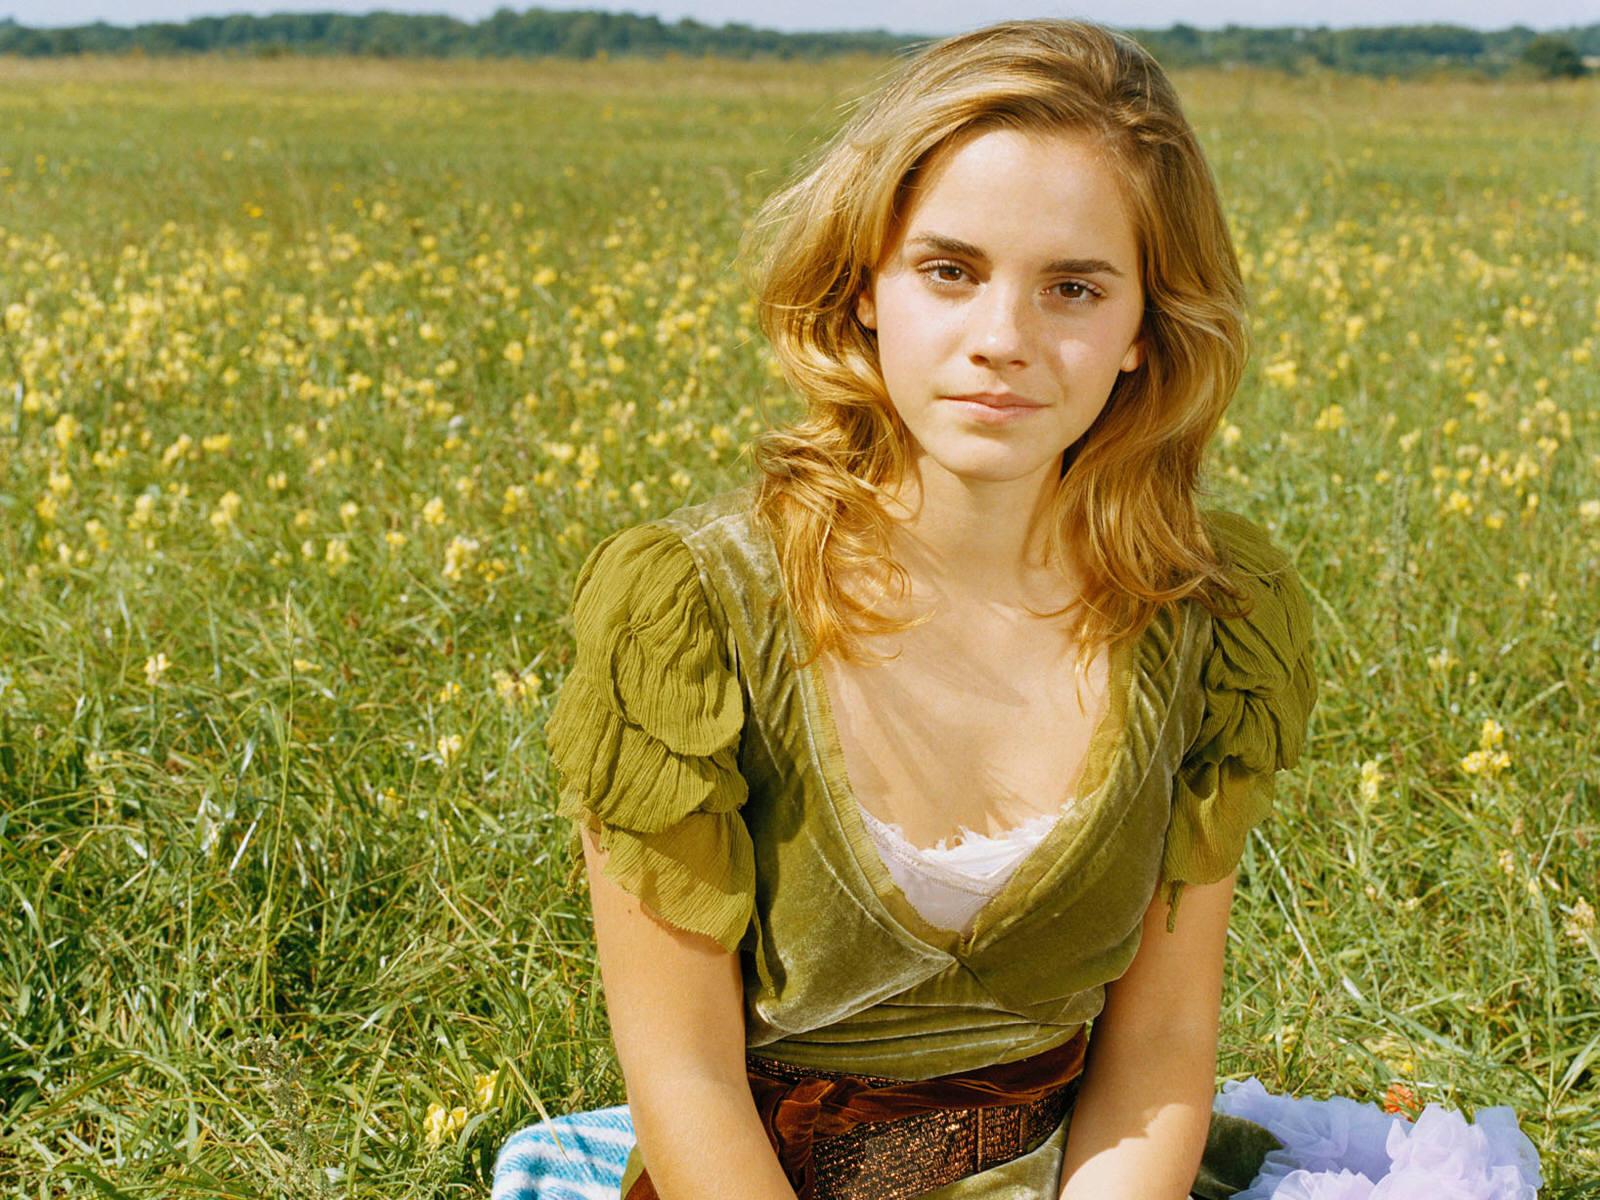 Samsung Mobile Wallpapers Emma Watson Hot Wallpapers 1600x1200